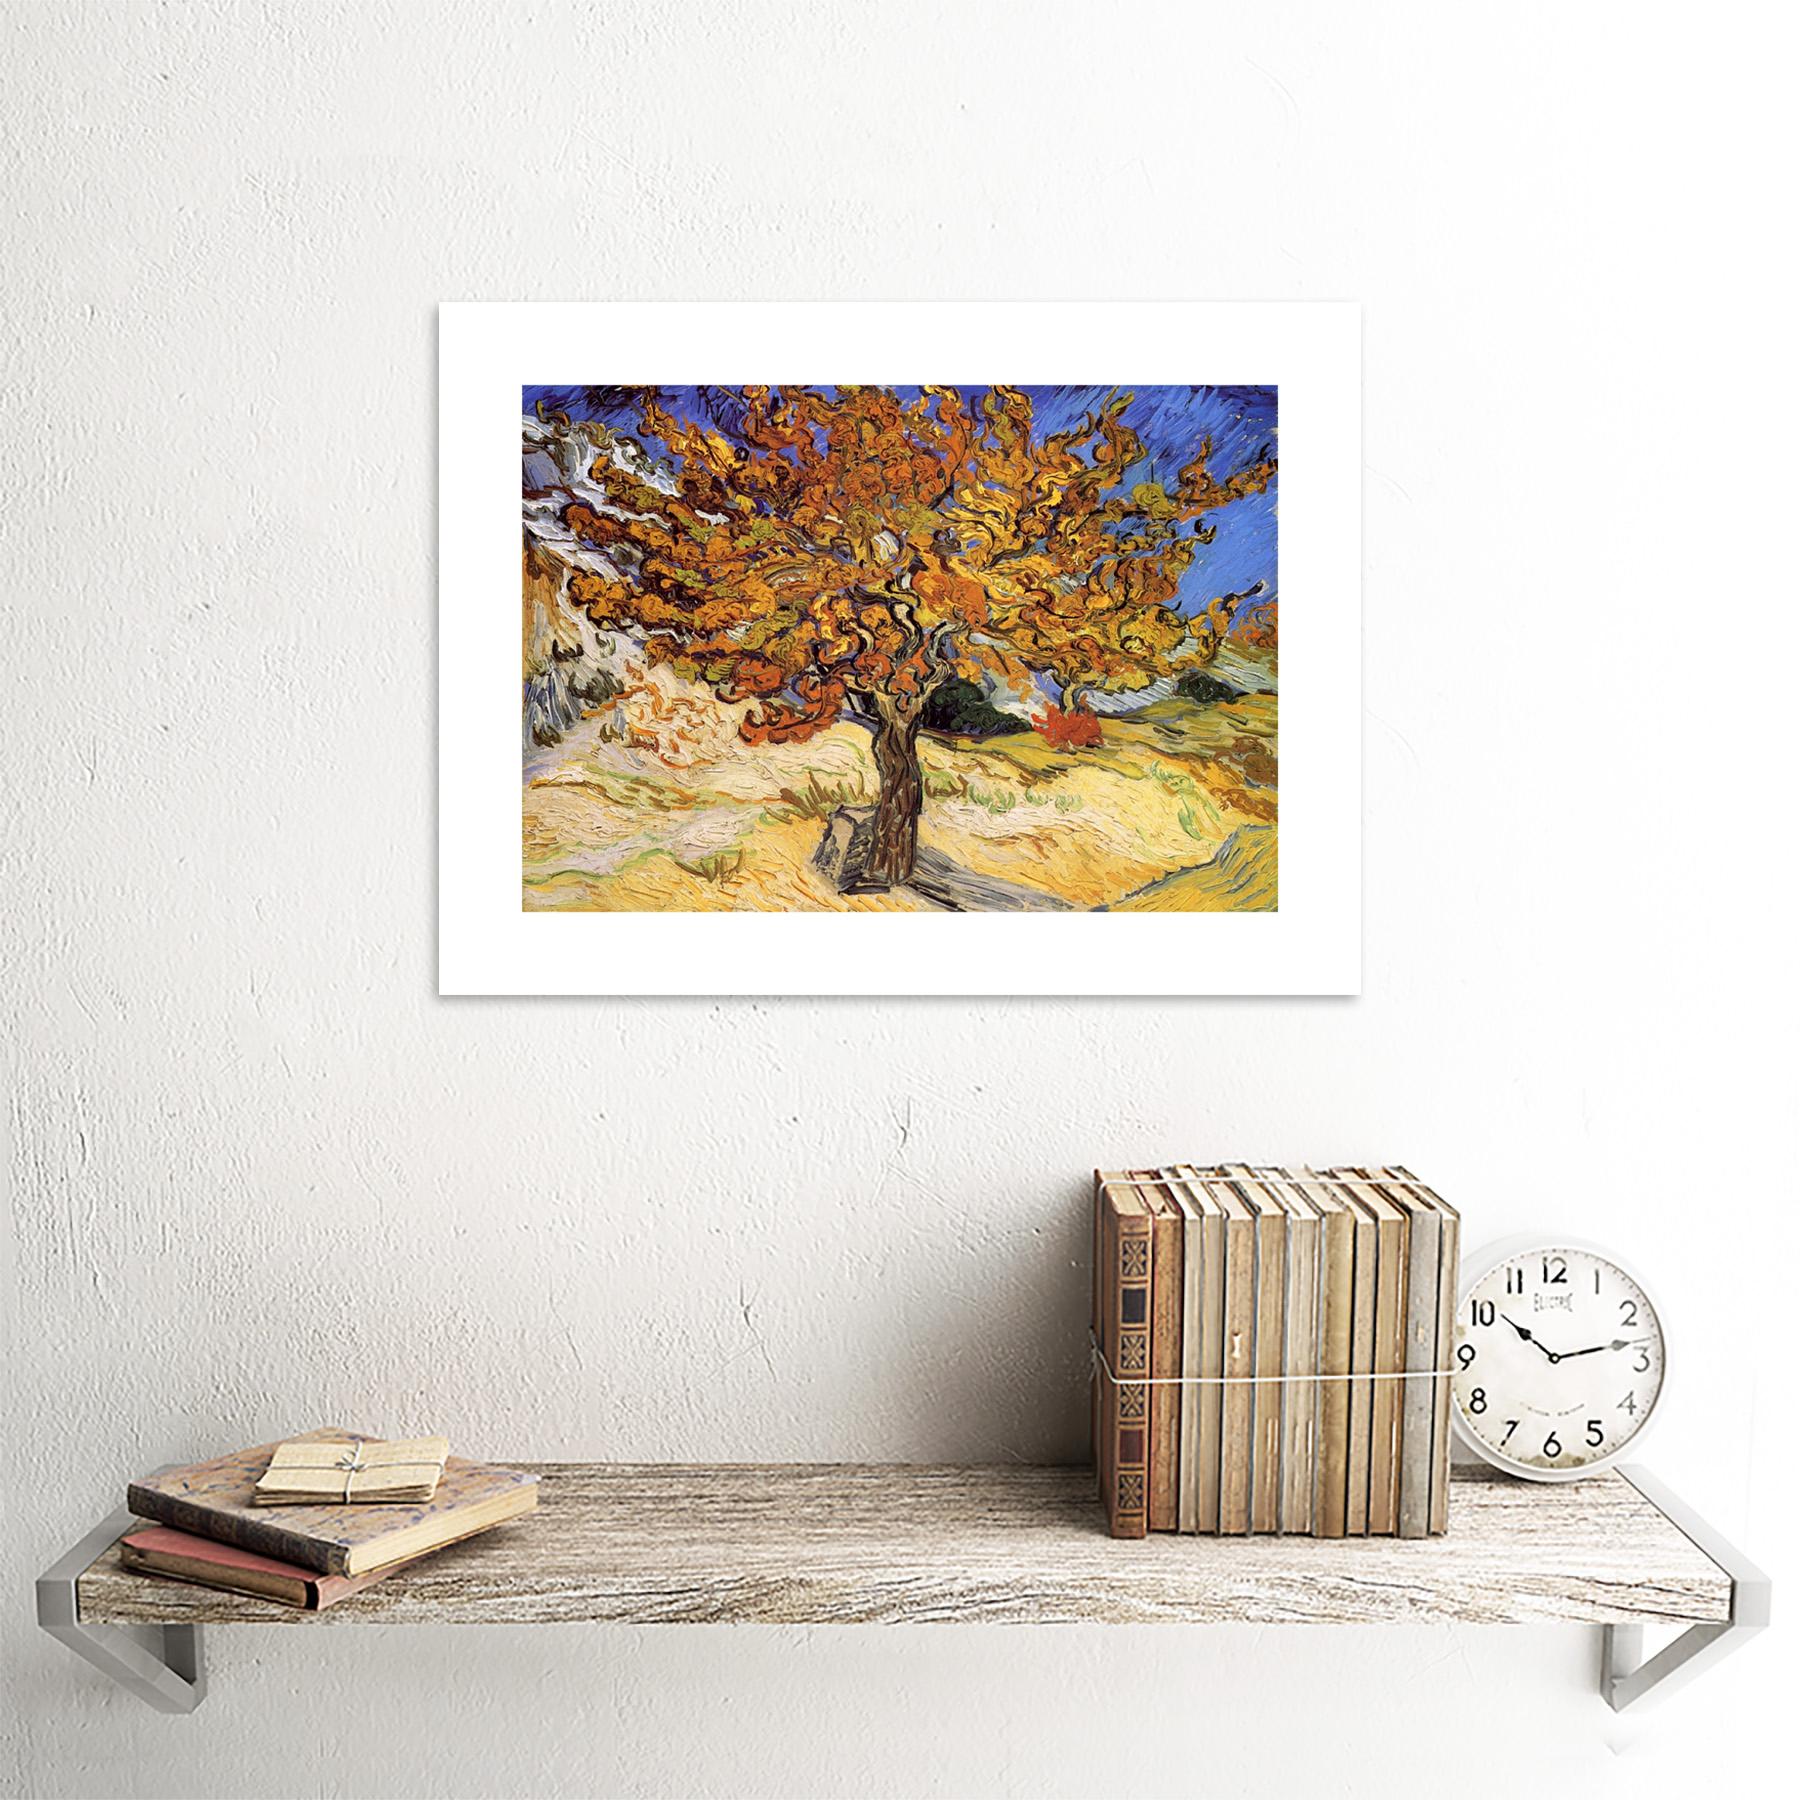 thumbnail 15 - Van-Gogh-Mulberry-Tree-1889-Old-Master-Framed-Wall-Art-Print